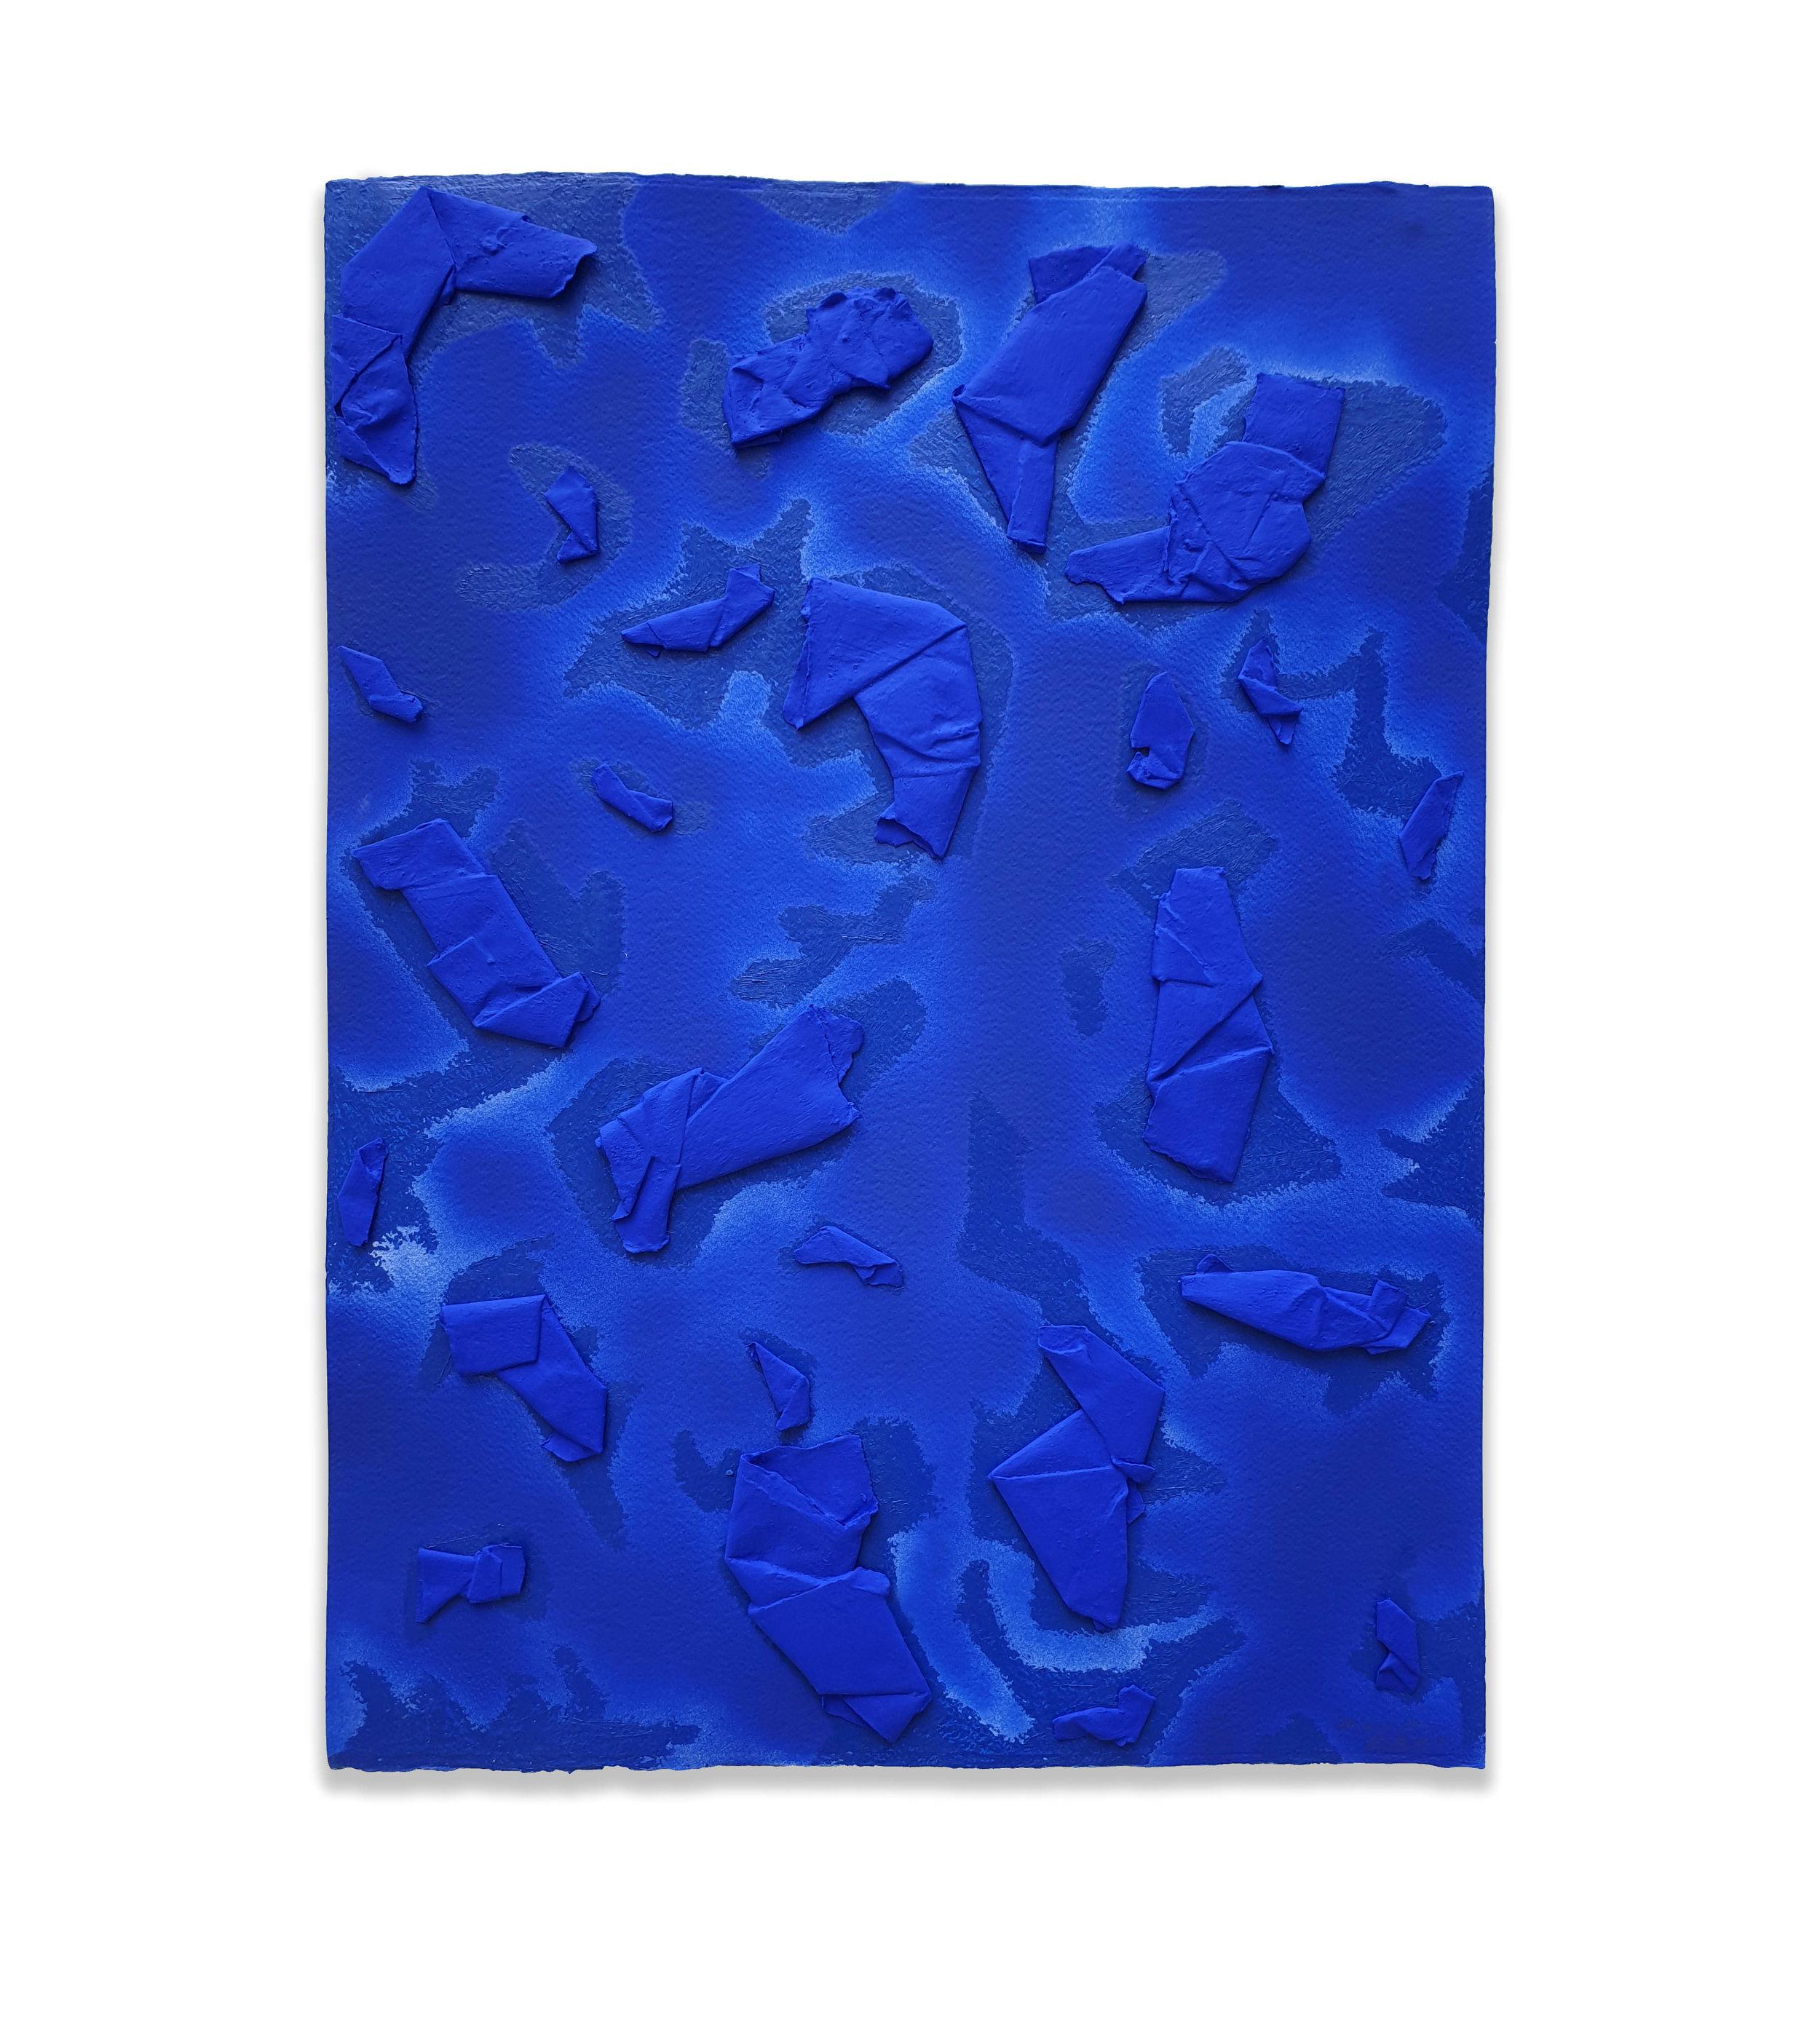 Ultramarine Dream  - 2019  Acrylic pigment, spray paint and oil stick on paper  76 x 56 cm